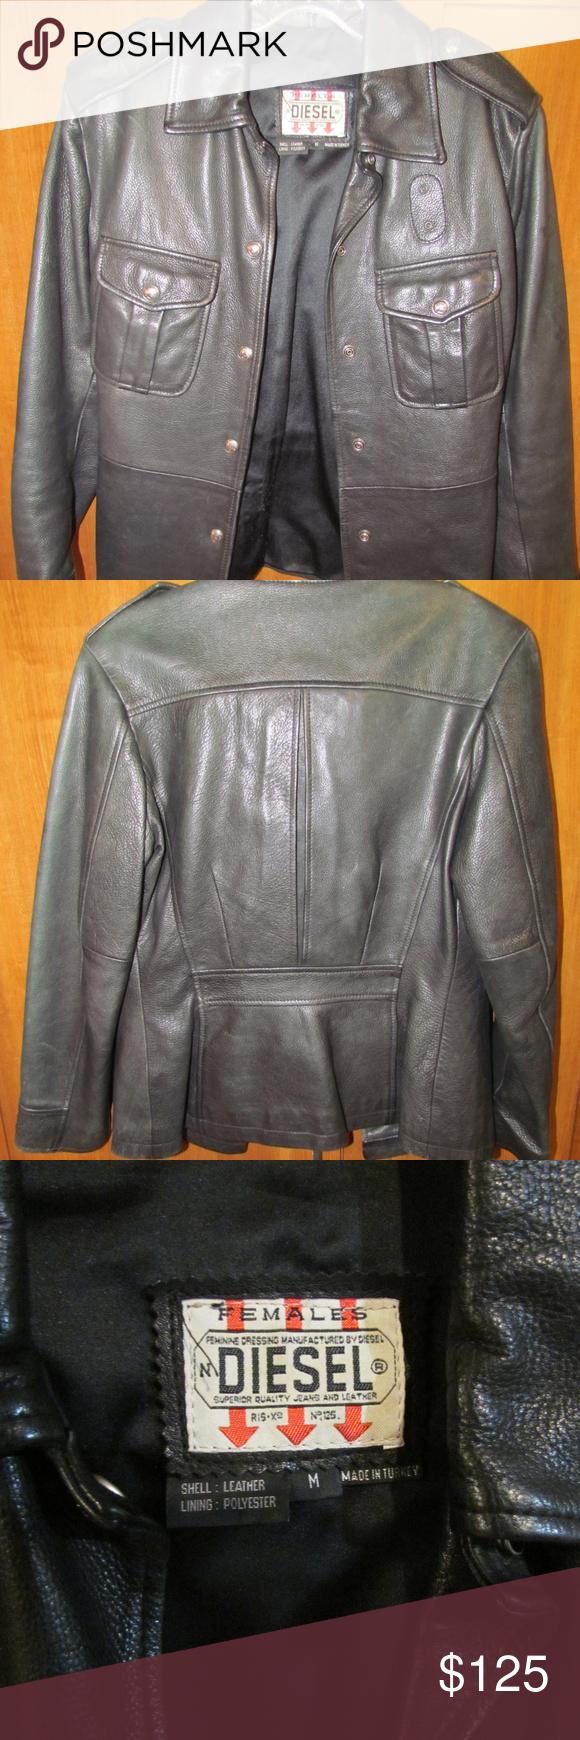 Females Diesel Leather Jacket Size Medium Leather jacket